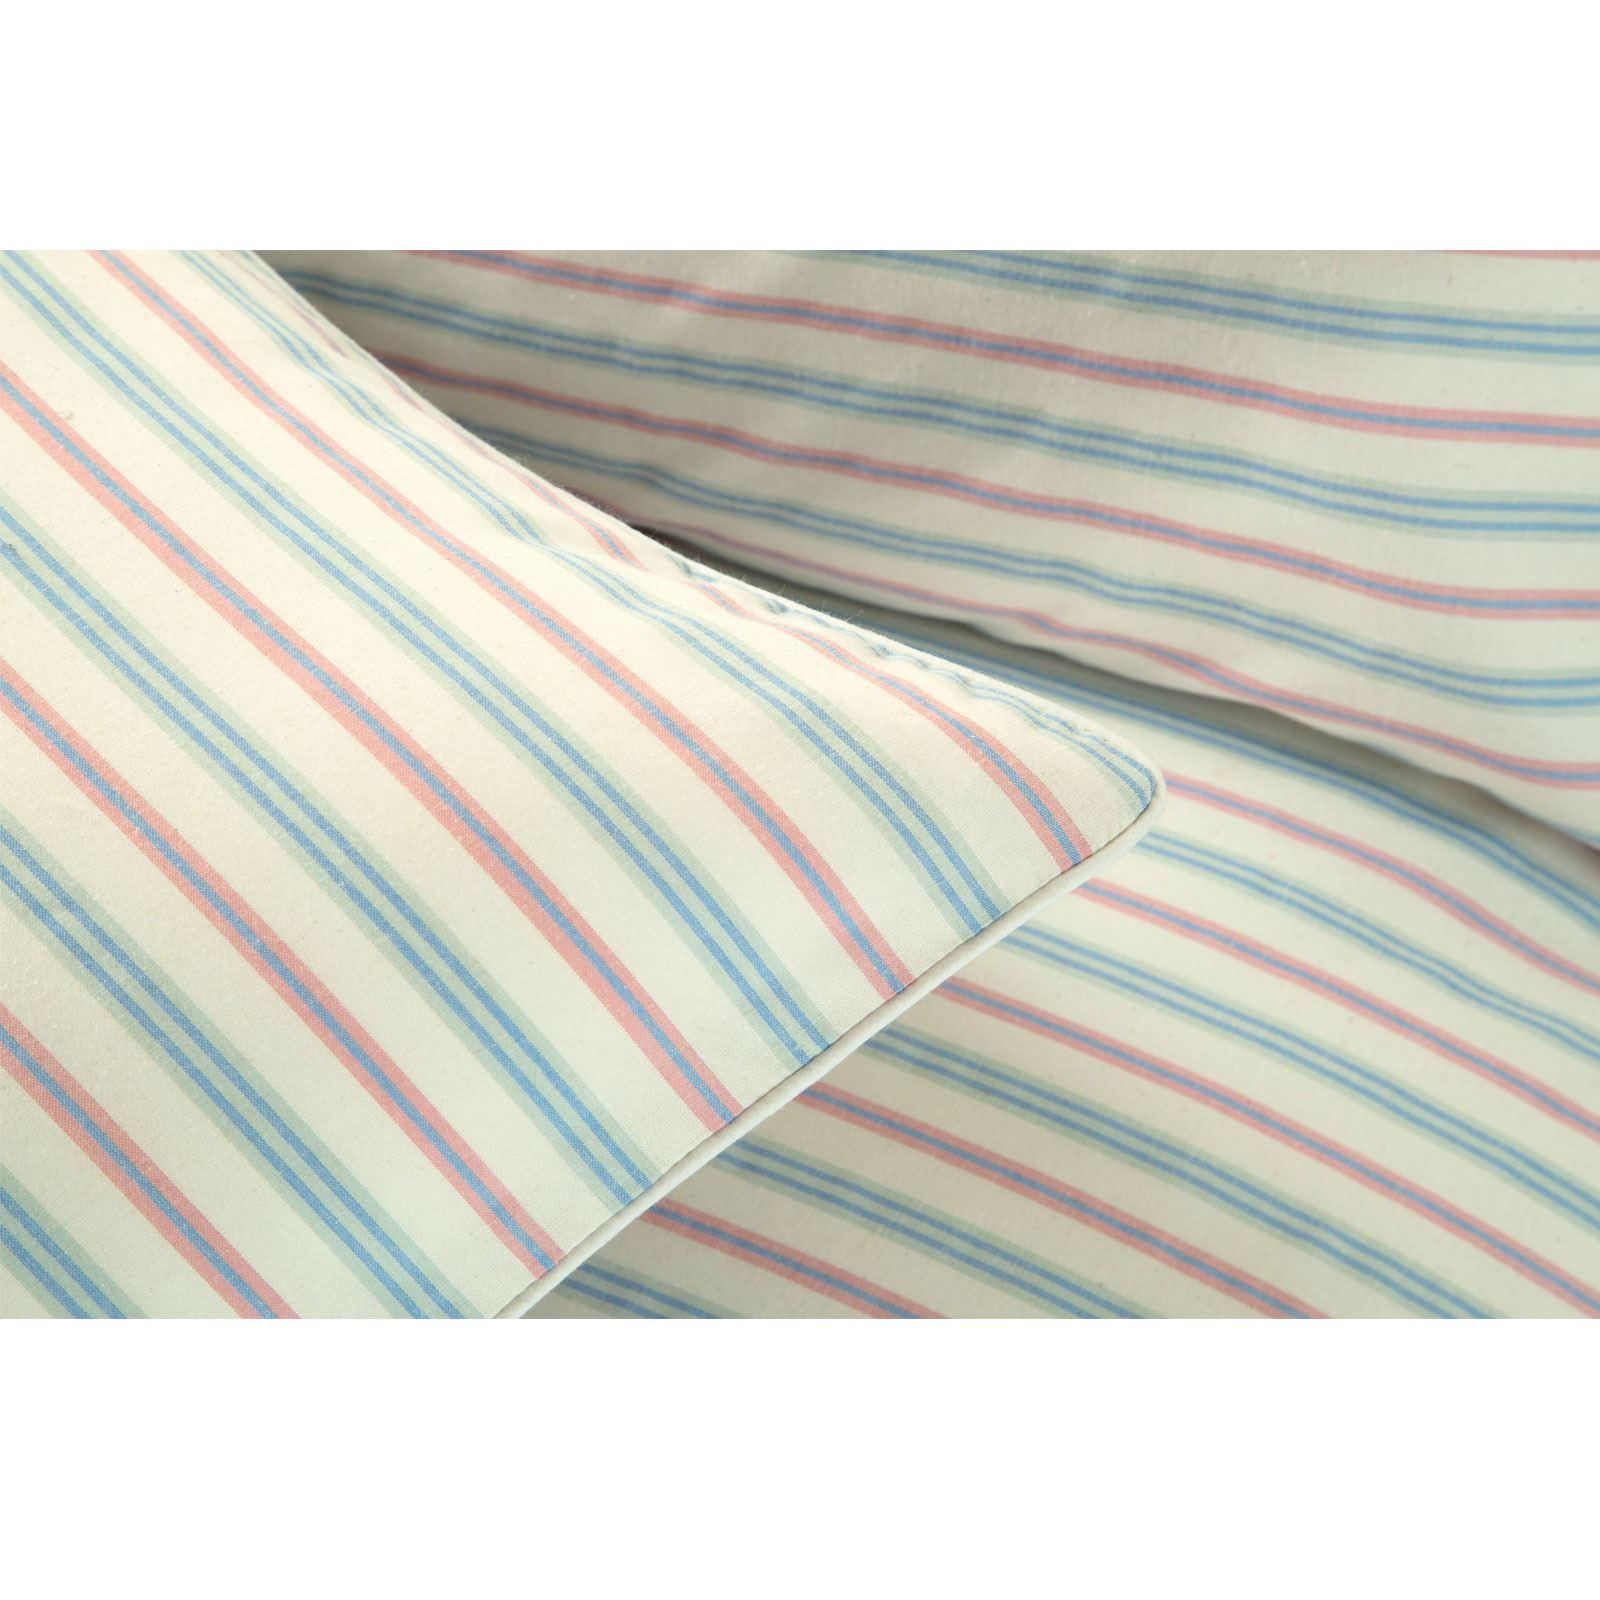 Hilo-de-algodon-de-lujo-Rico-Suave-Chambray-tenido-de-Cubierta-de-edredon-a-rayas-de-tejido-a-rayas miniatura 4